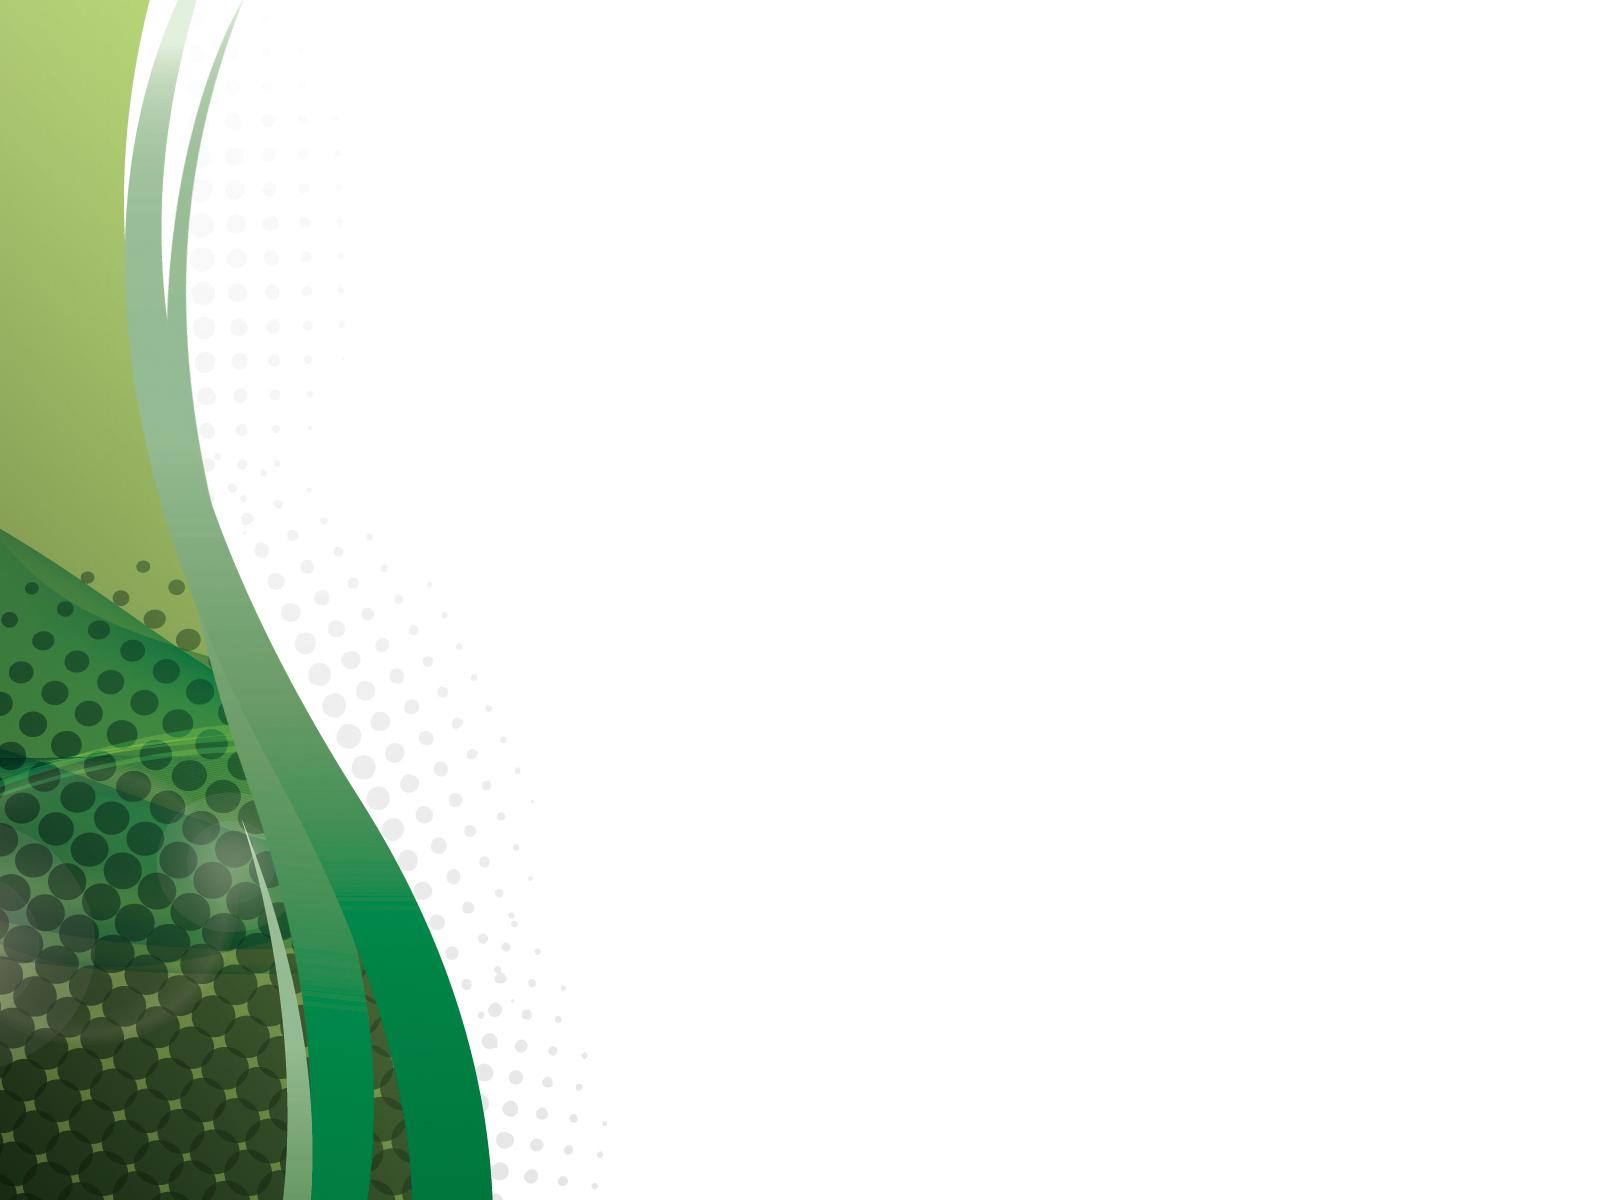 3d Cisco 2016 Hd Wallpaper Powerpoint Theme Fotolip Com Rich Image And Wallpaper